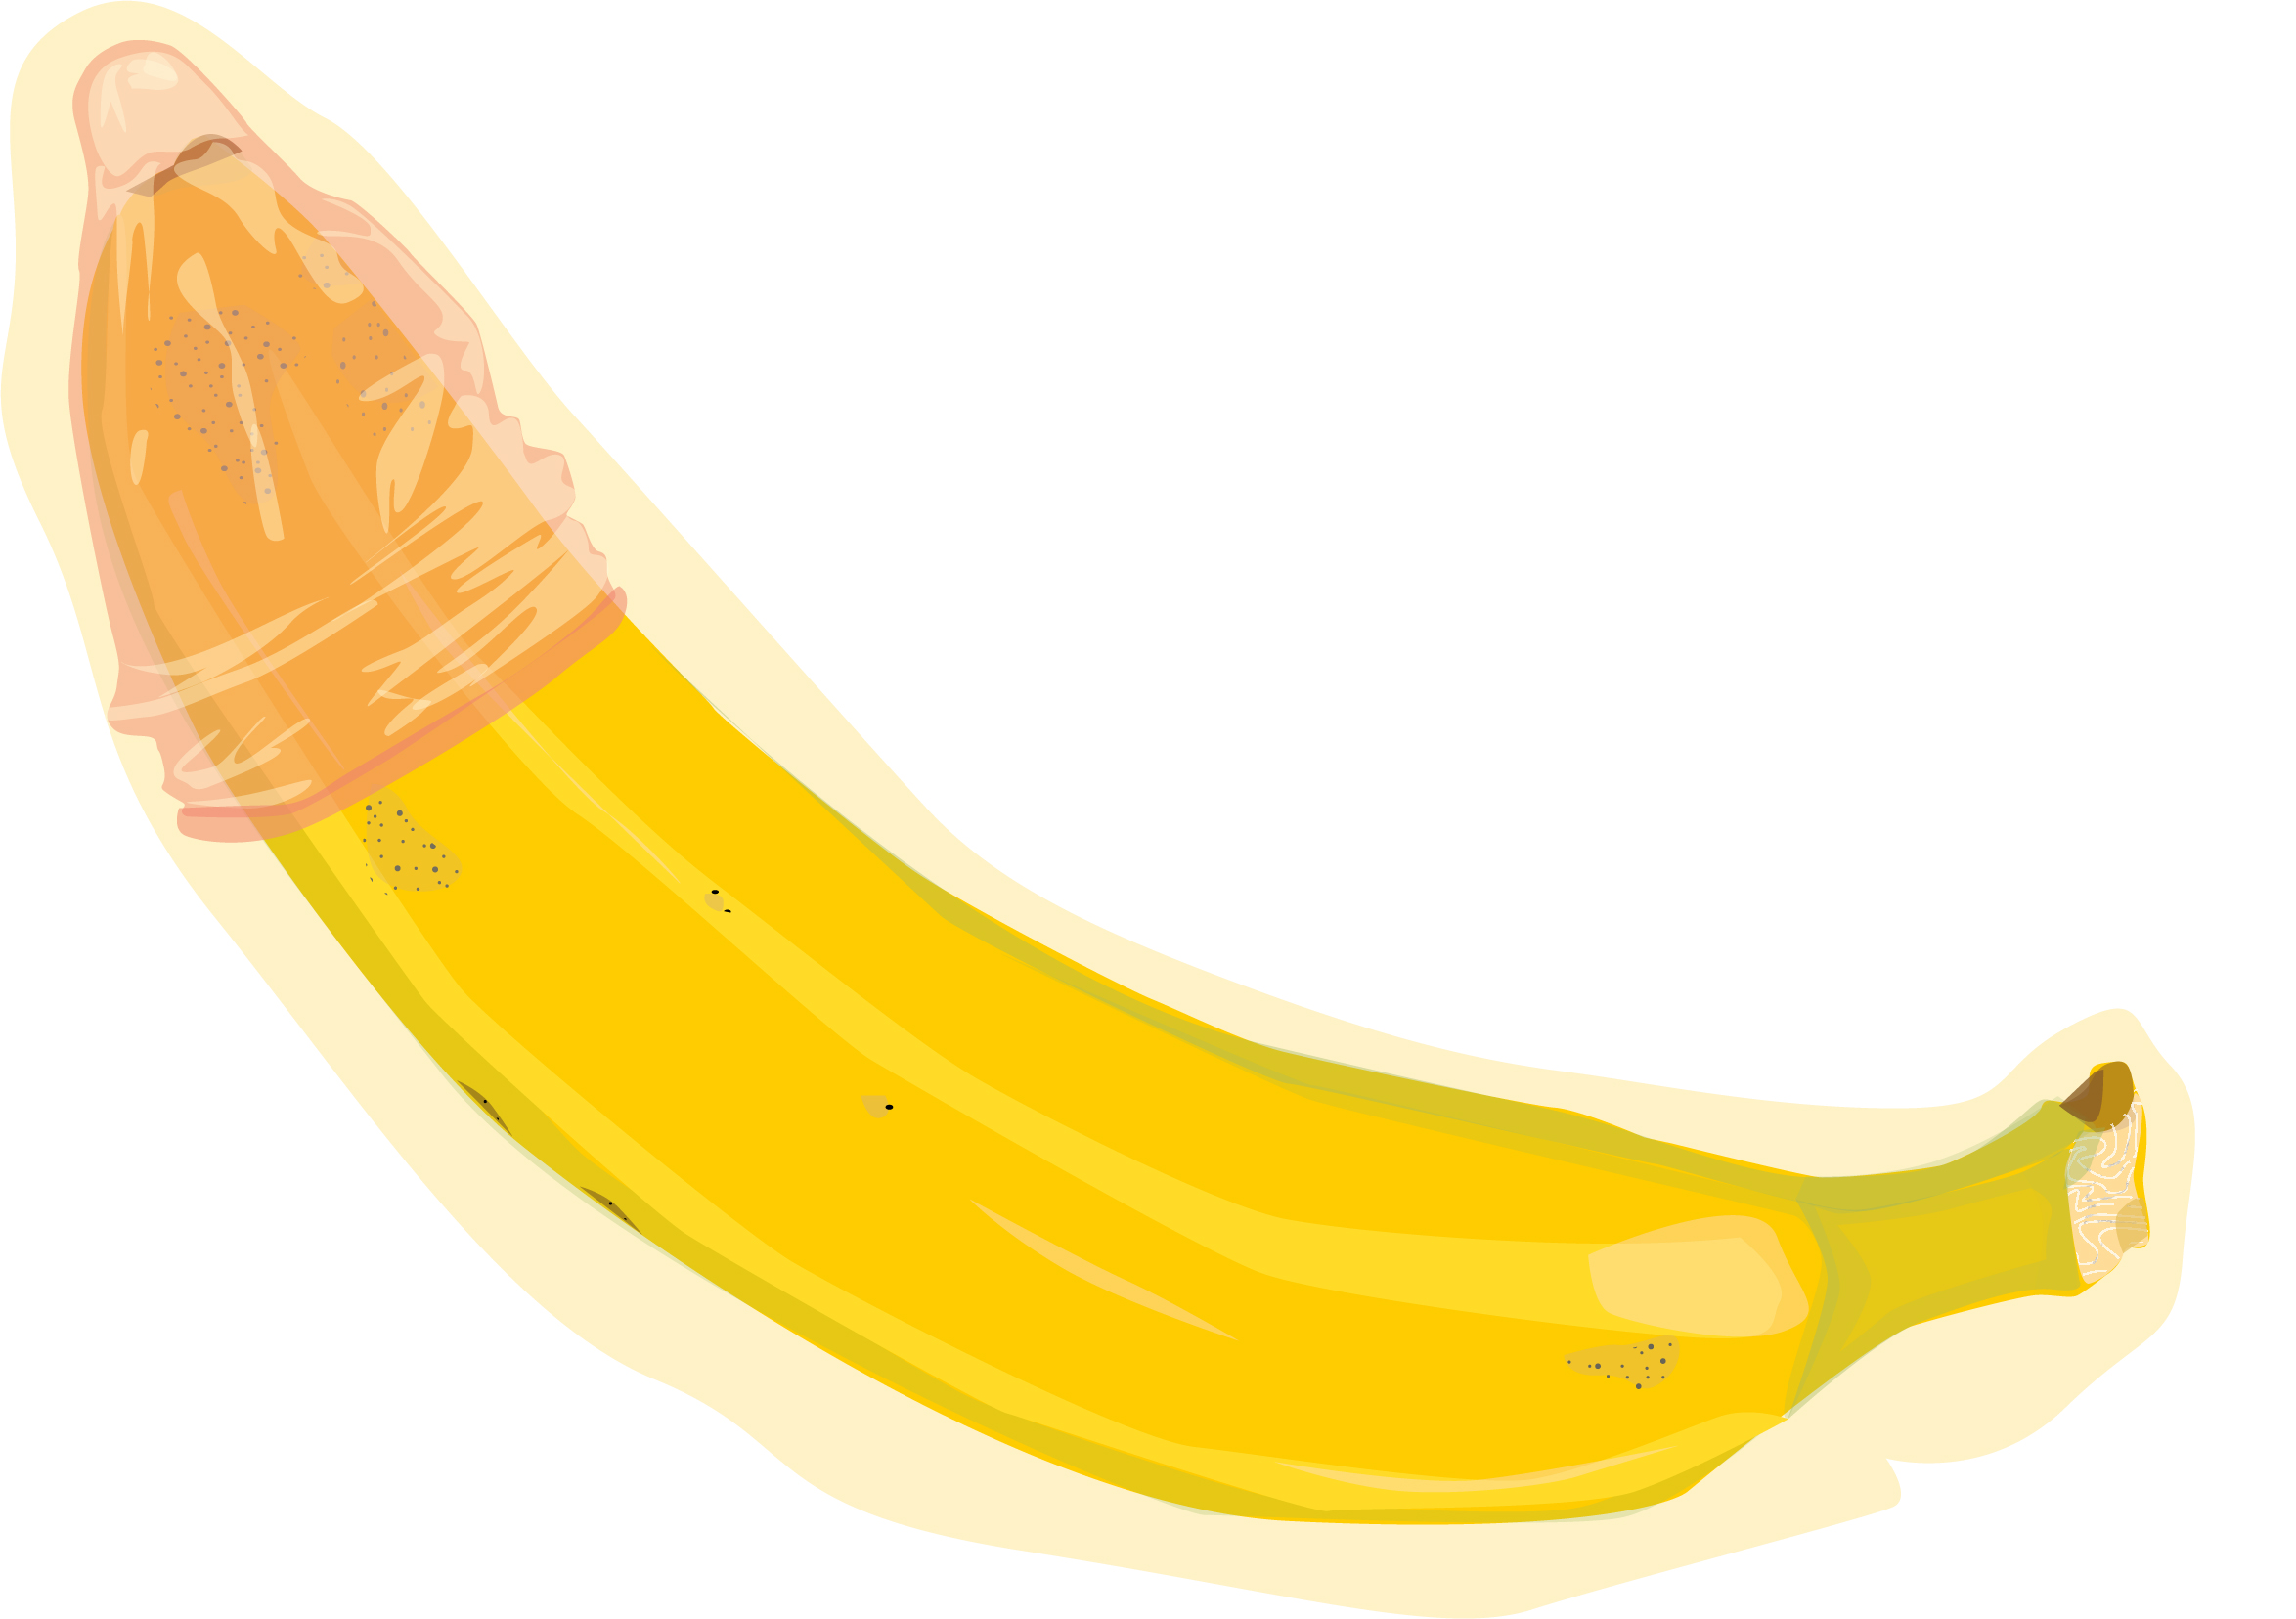 kondomer apoteket dating sida